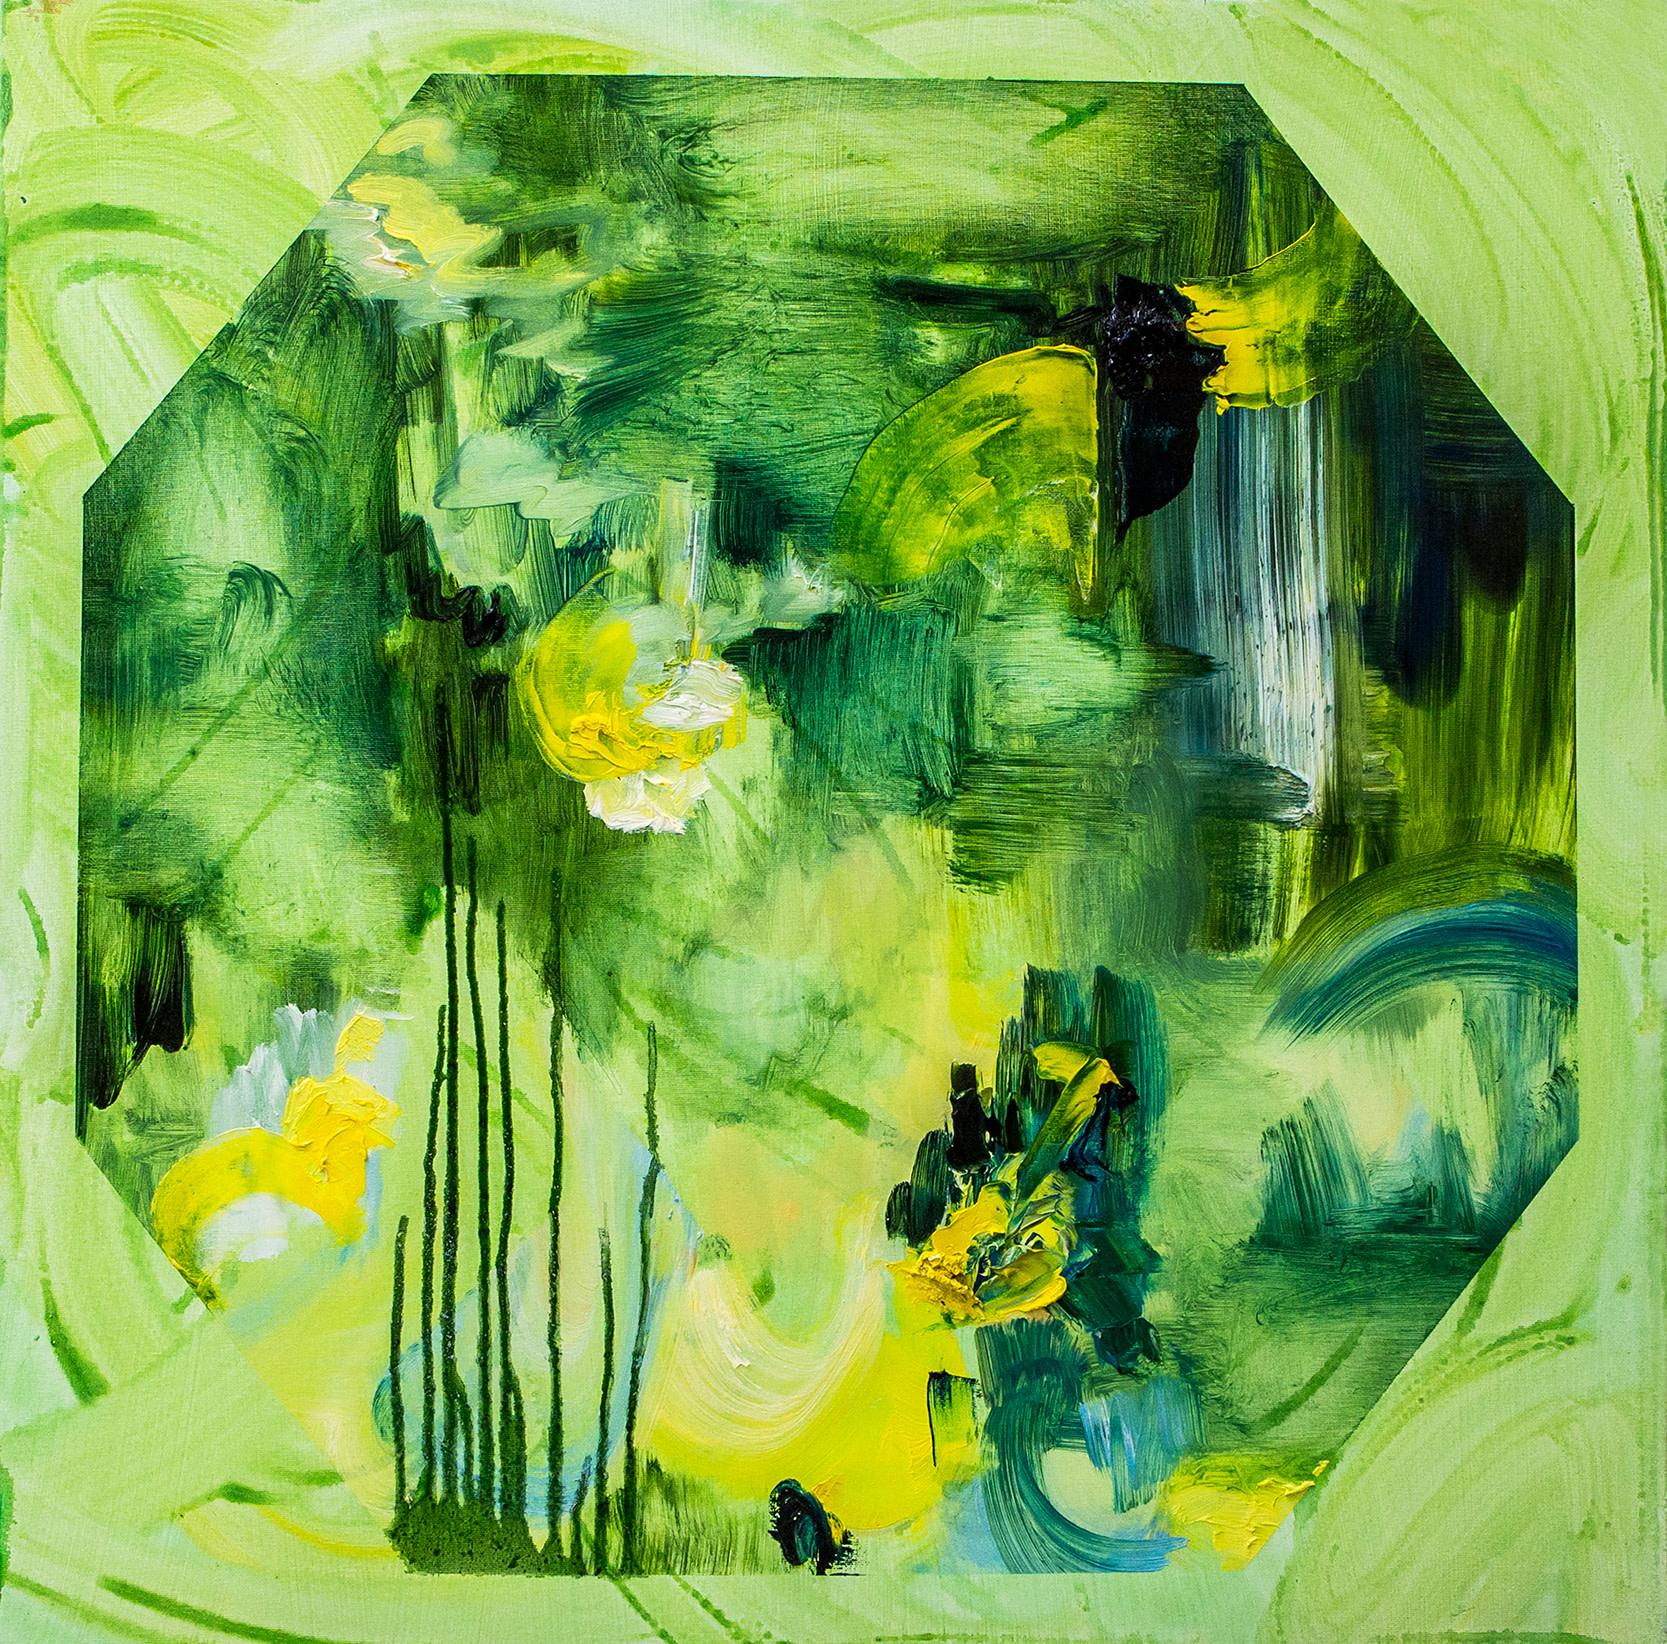 "<span class=""link fancybox-details-link""><a href=""/artists/118-kate-dunn/works/2838/"">View Detail Page</a></span><div class=""artist""><strong>Kate Dunn</strong></div> <div class=""title""><em>Pedantic Semantic</em>, 2018</div> <div class=""medium"">Acrylic Paint and Oil Paint on Canvas</div> <div class=""dimensions"">90 x 90 cm.<br /> 35 3/8 x 35 3/8 in.</div><div class=""copyright_line"">Copyright The Artist</div>"